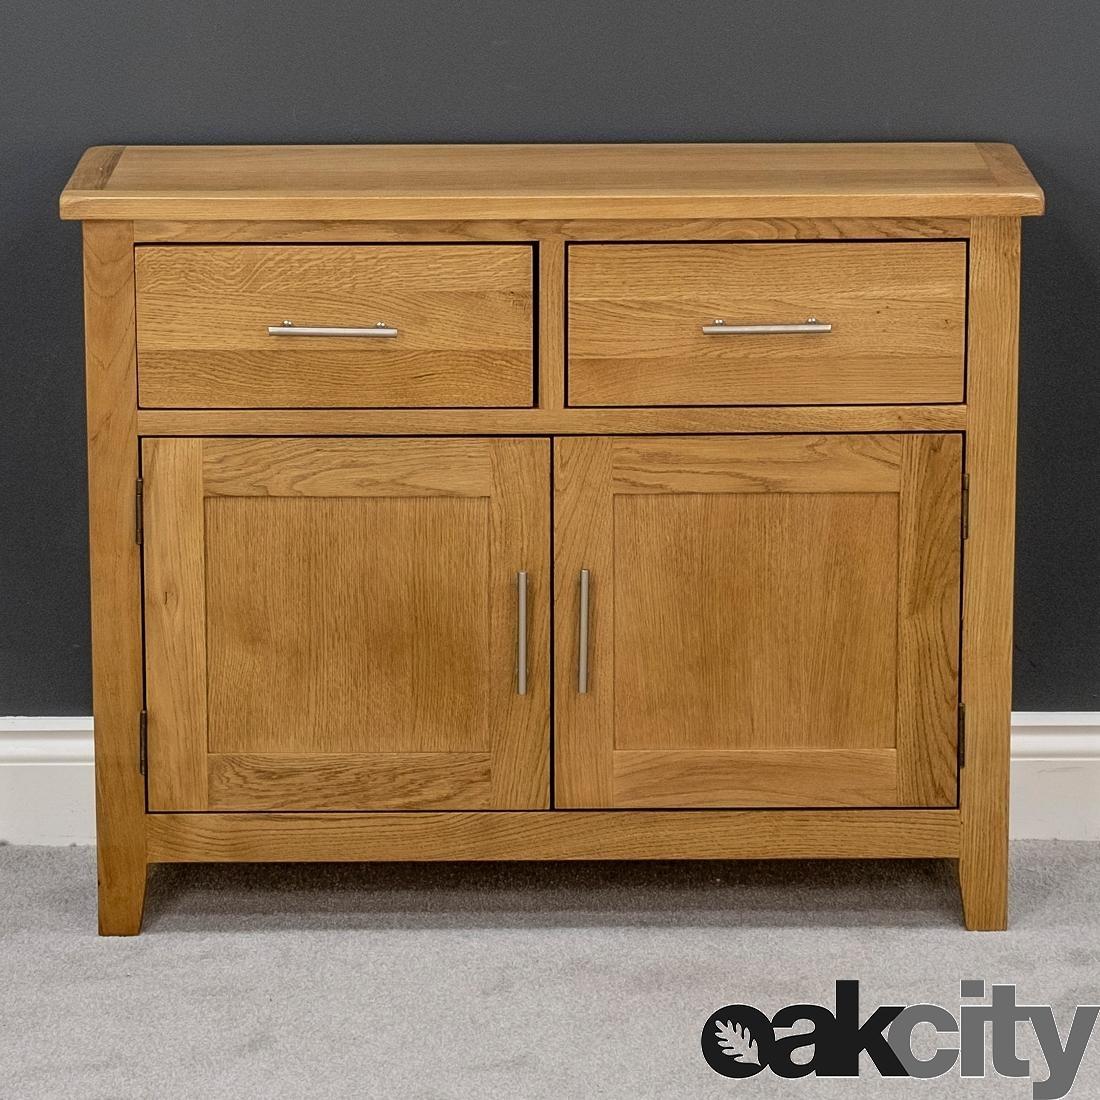 Nebraska Oak Sideboard / Small Solid Wood 2 Door Storage Cabinet Intended For Best And Newest Natural Oak Wood 2 Door Sideboards (View 2 of 20)